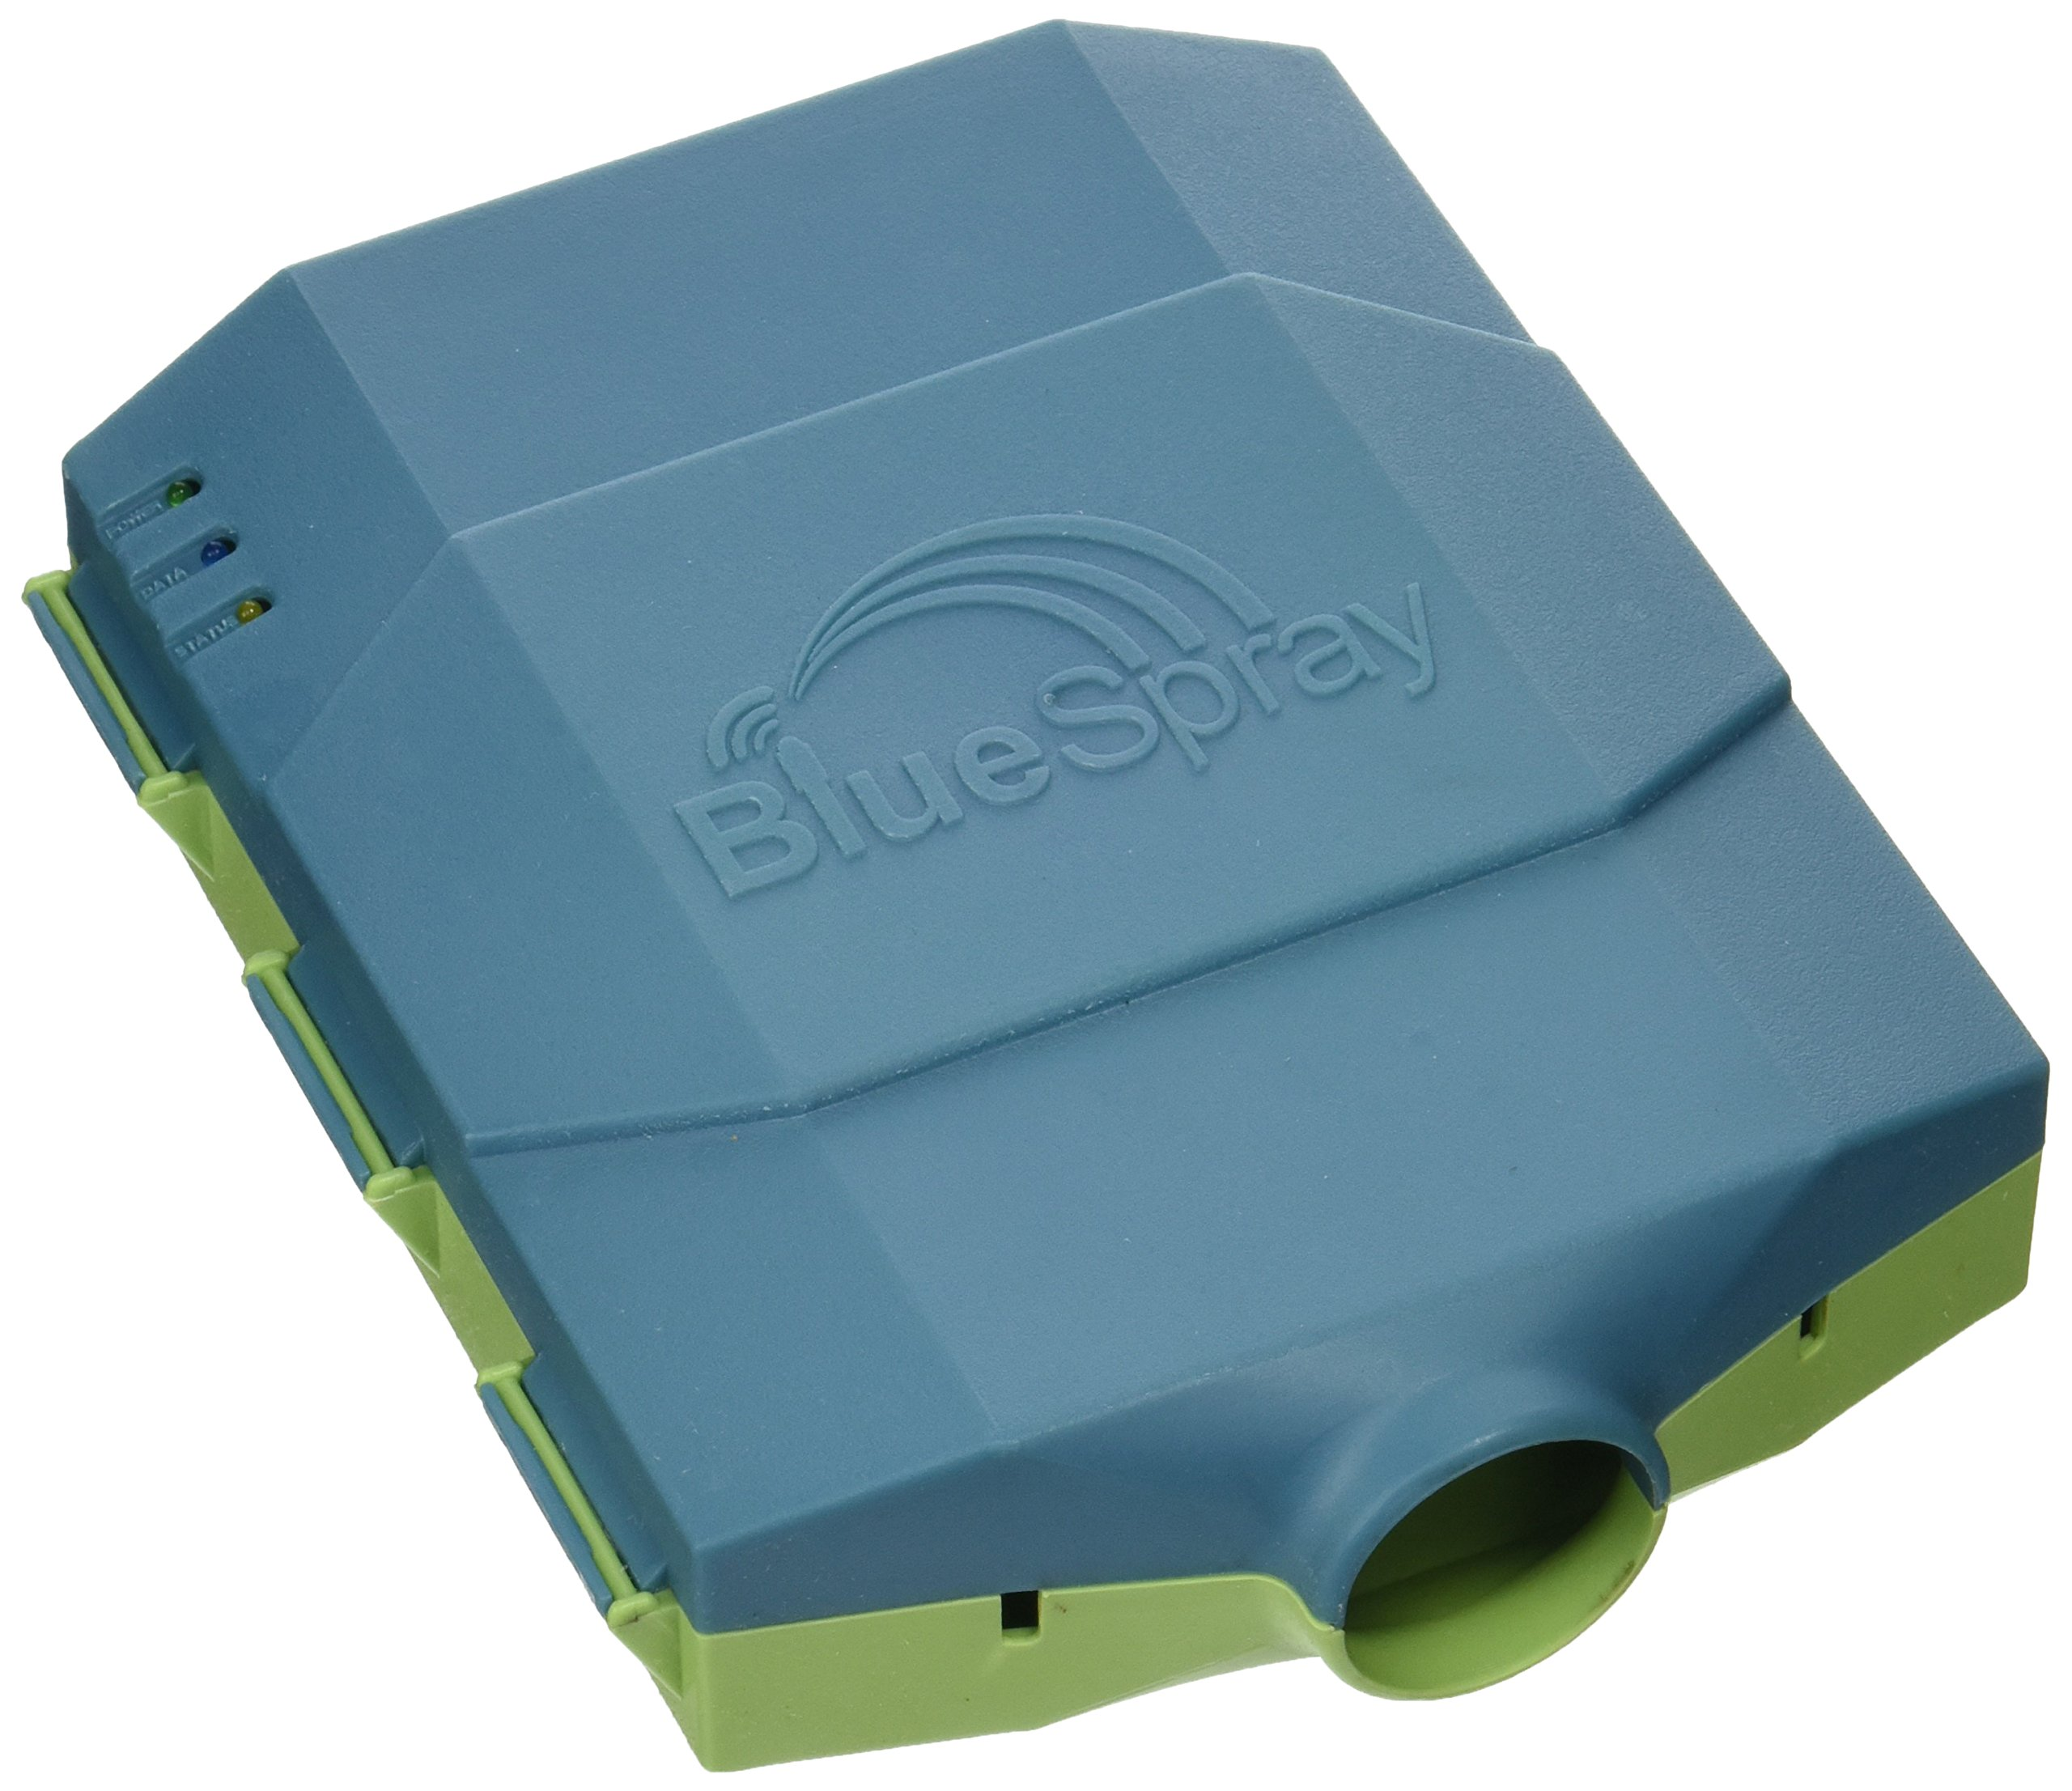 BlueSpray BSC16i 16 Zone Wireless Unit Smart Wifi Sprinkler Controller Timer